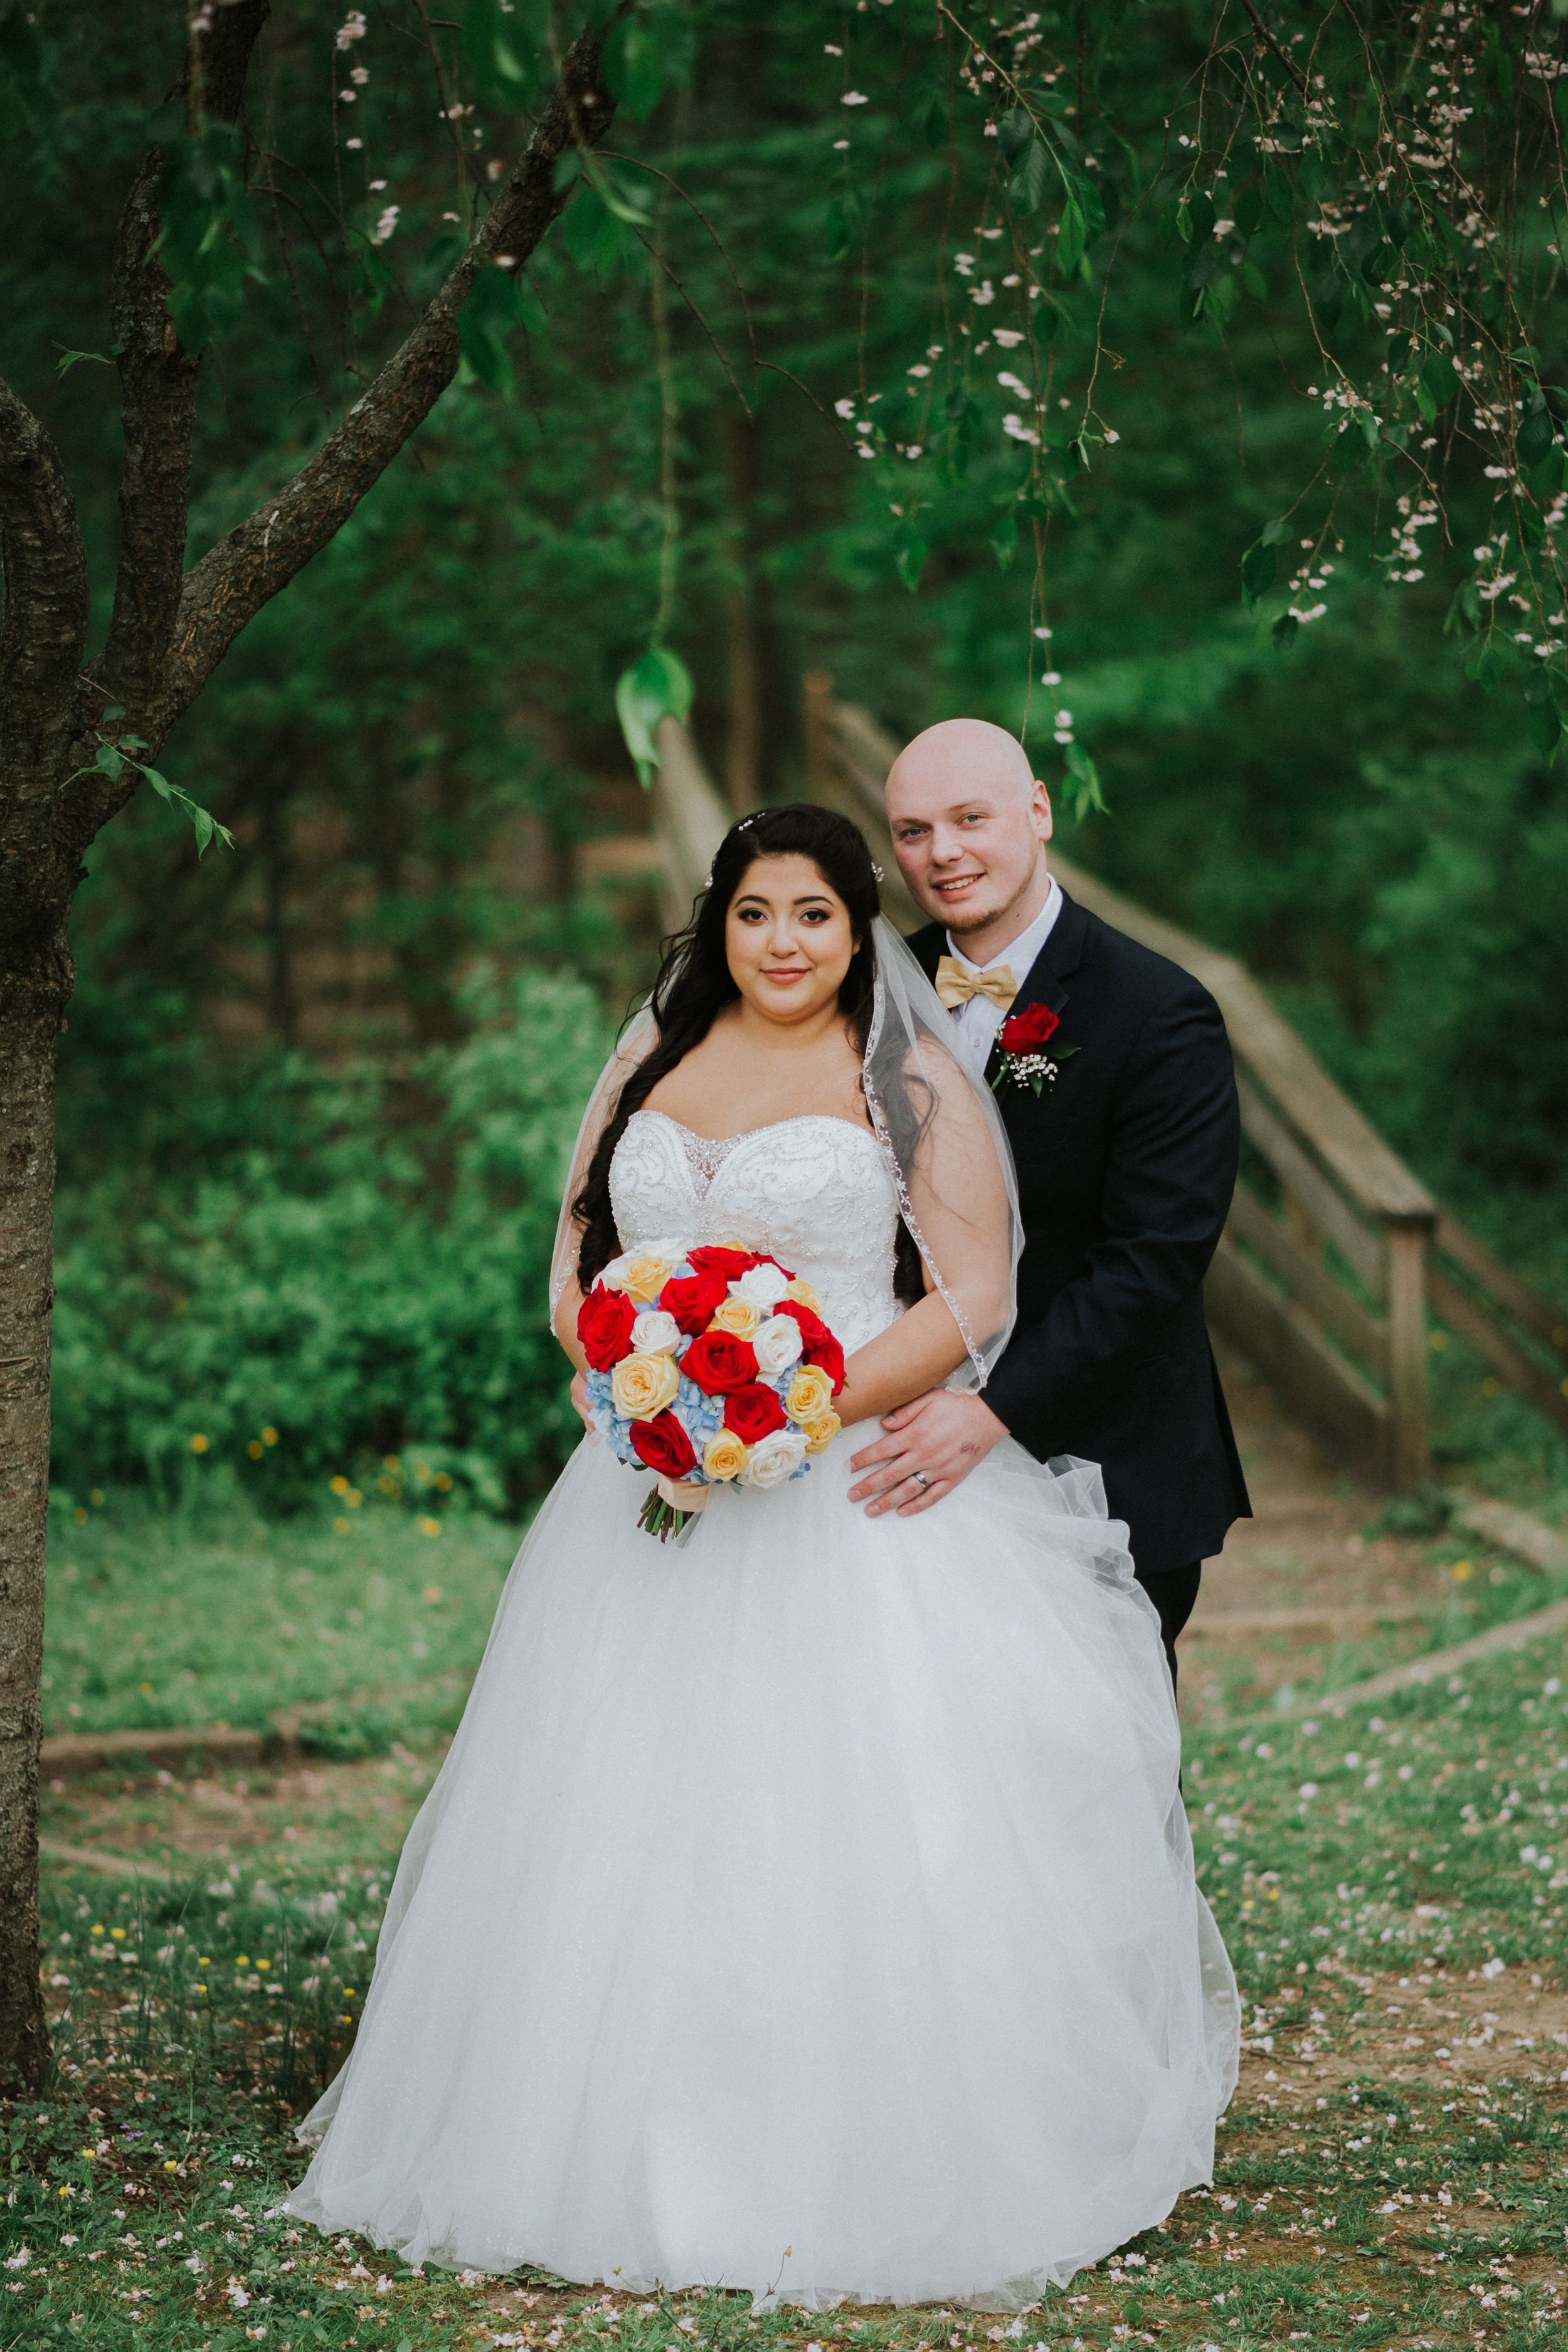 Barclay-Farmstead-Wedding-Rosa-and-Mike-398.jpg